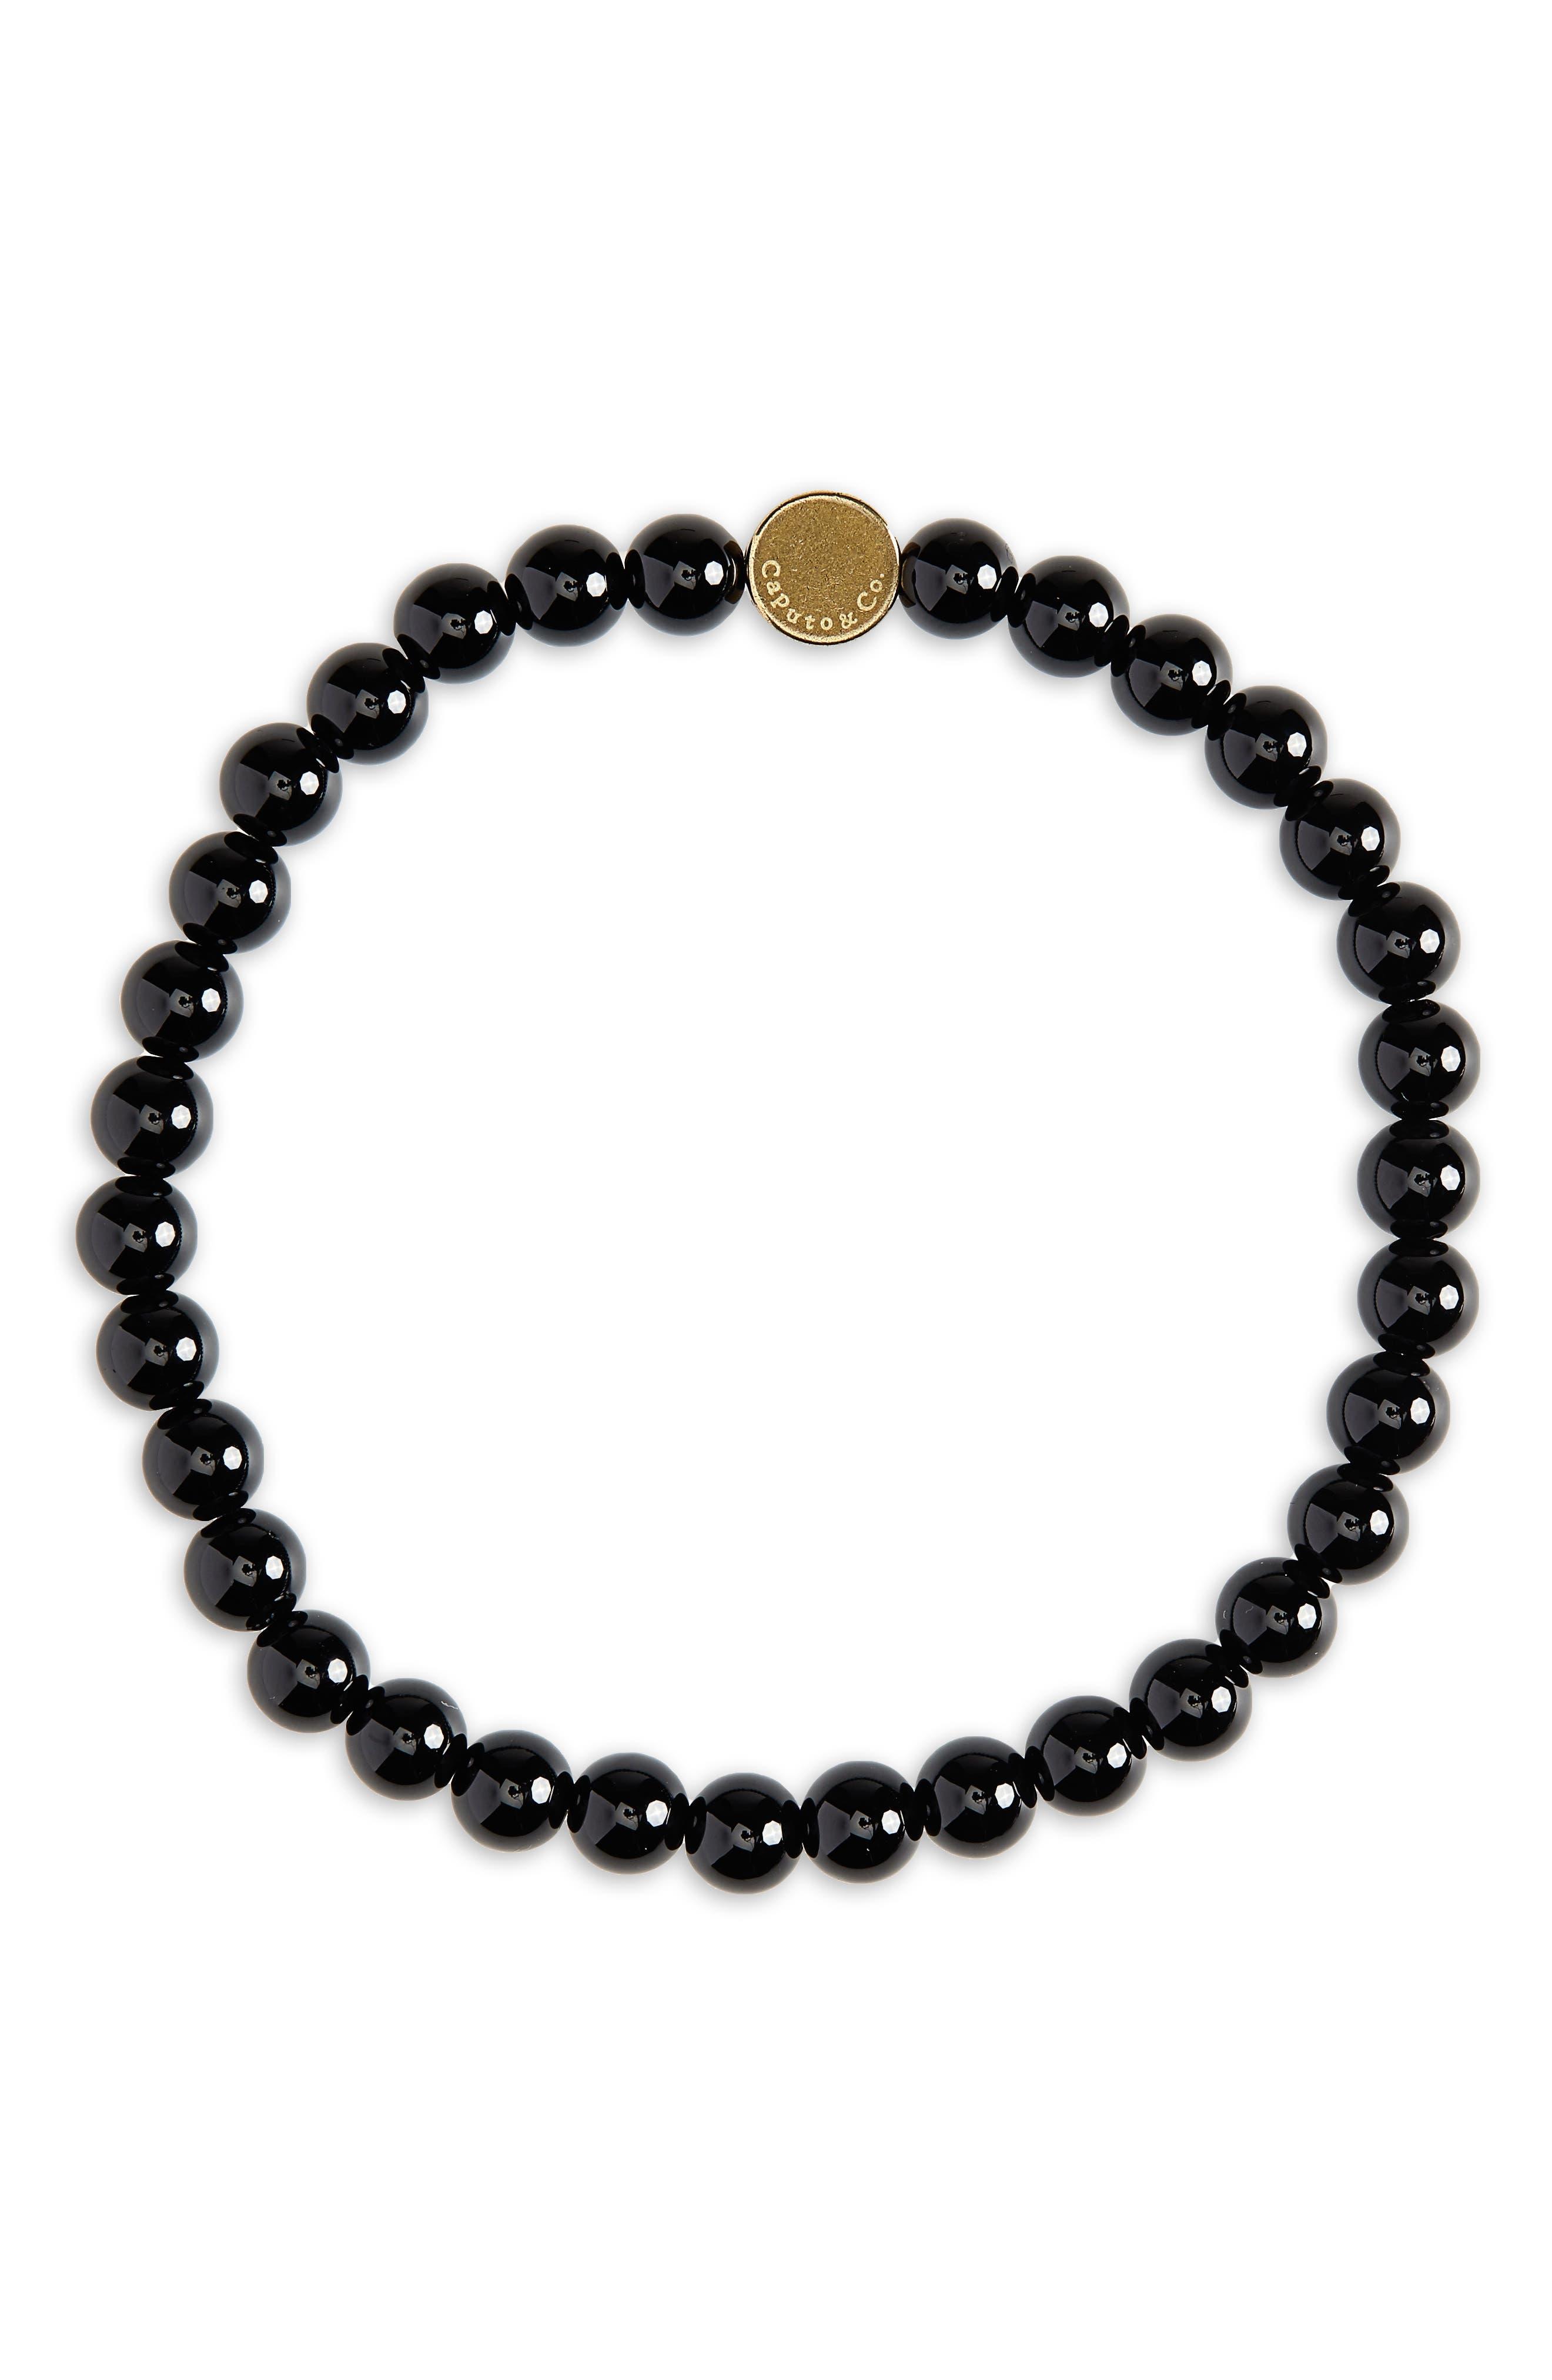 CAPUTO & CO. Stone Bead Bracelet in Black Onyx